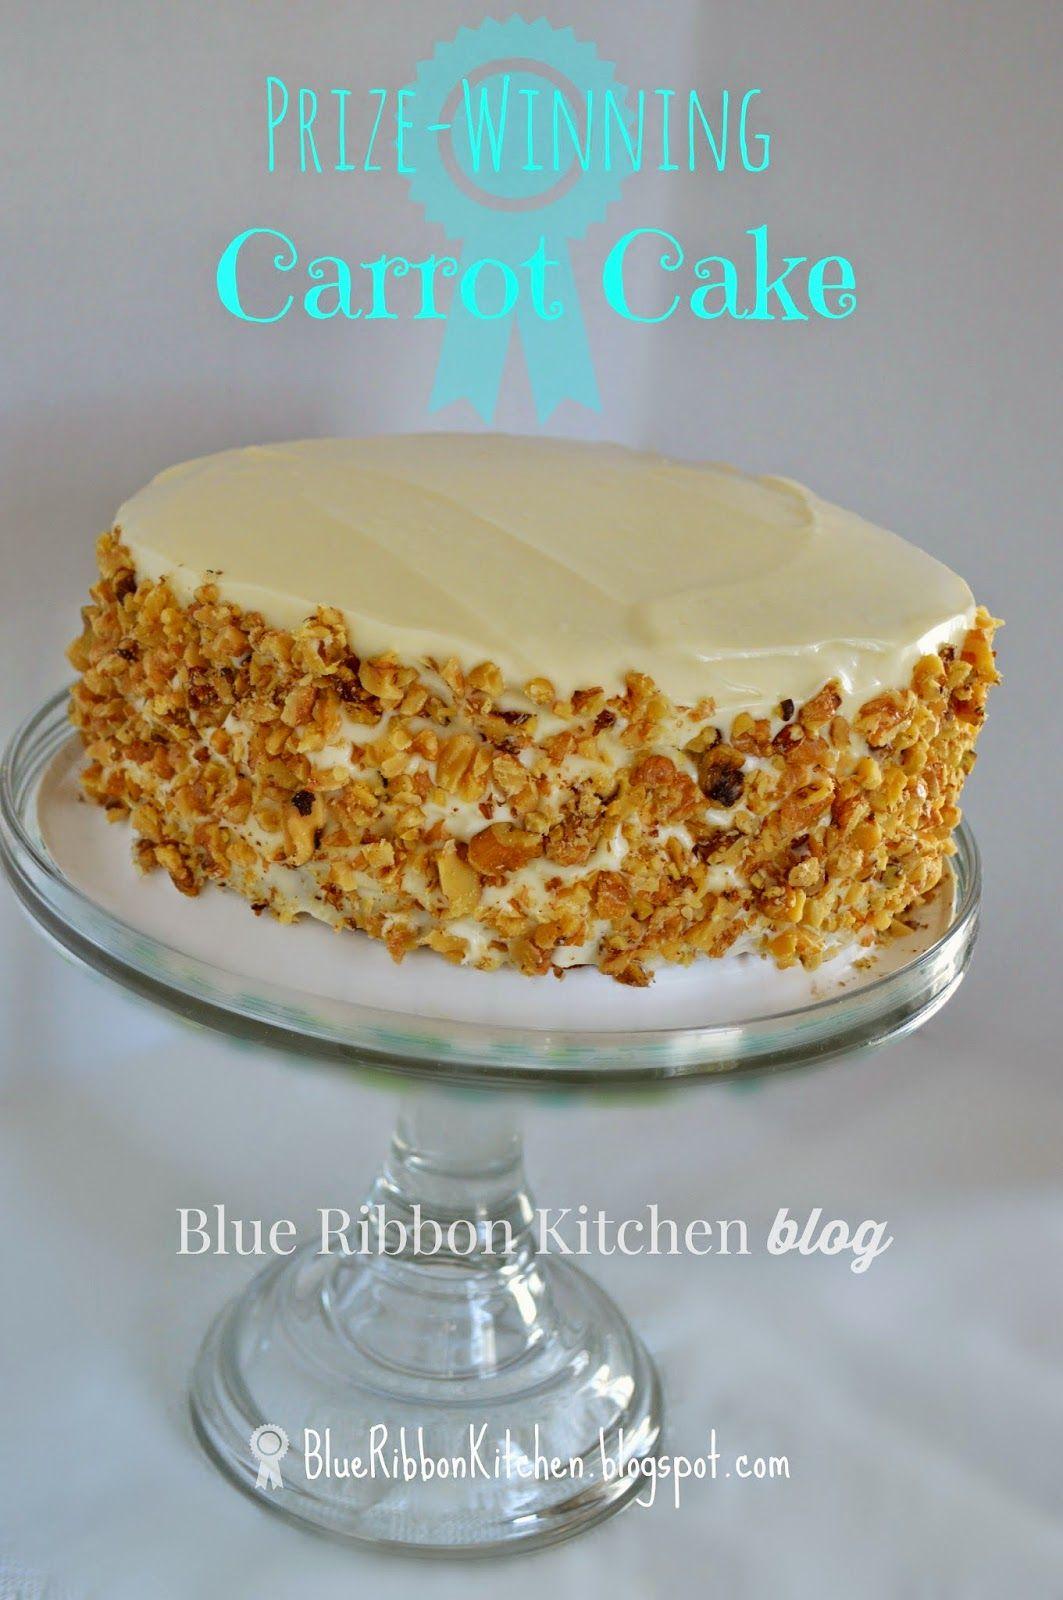 Blue Ribbon Kitchen Prize Winning Carrot Cake Eating Your